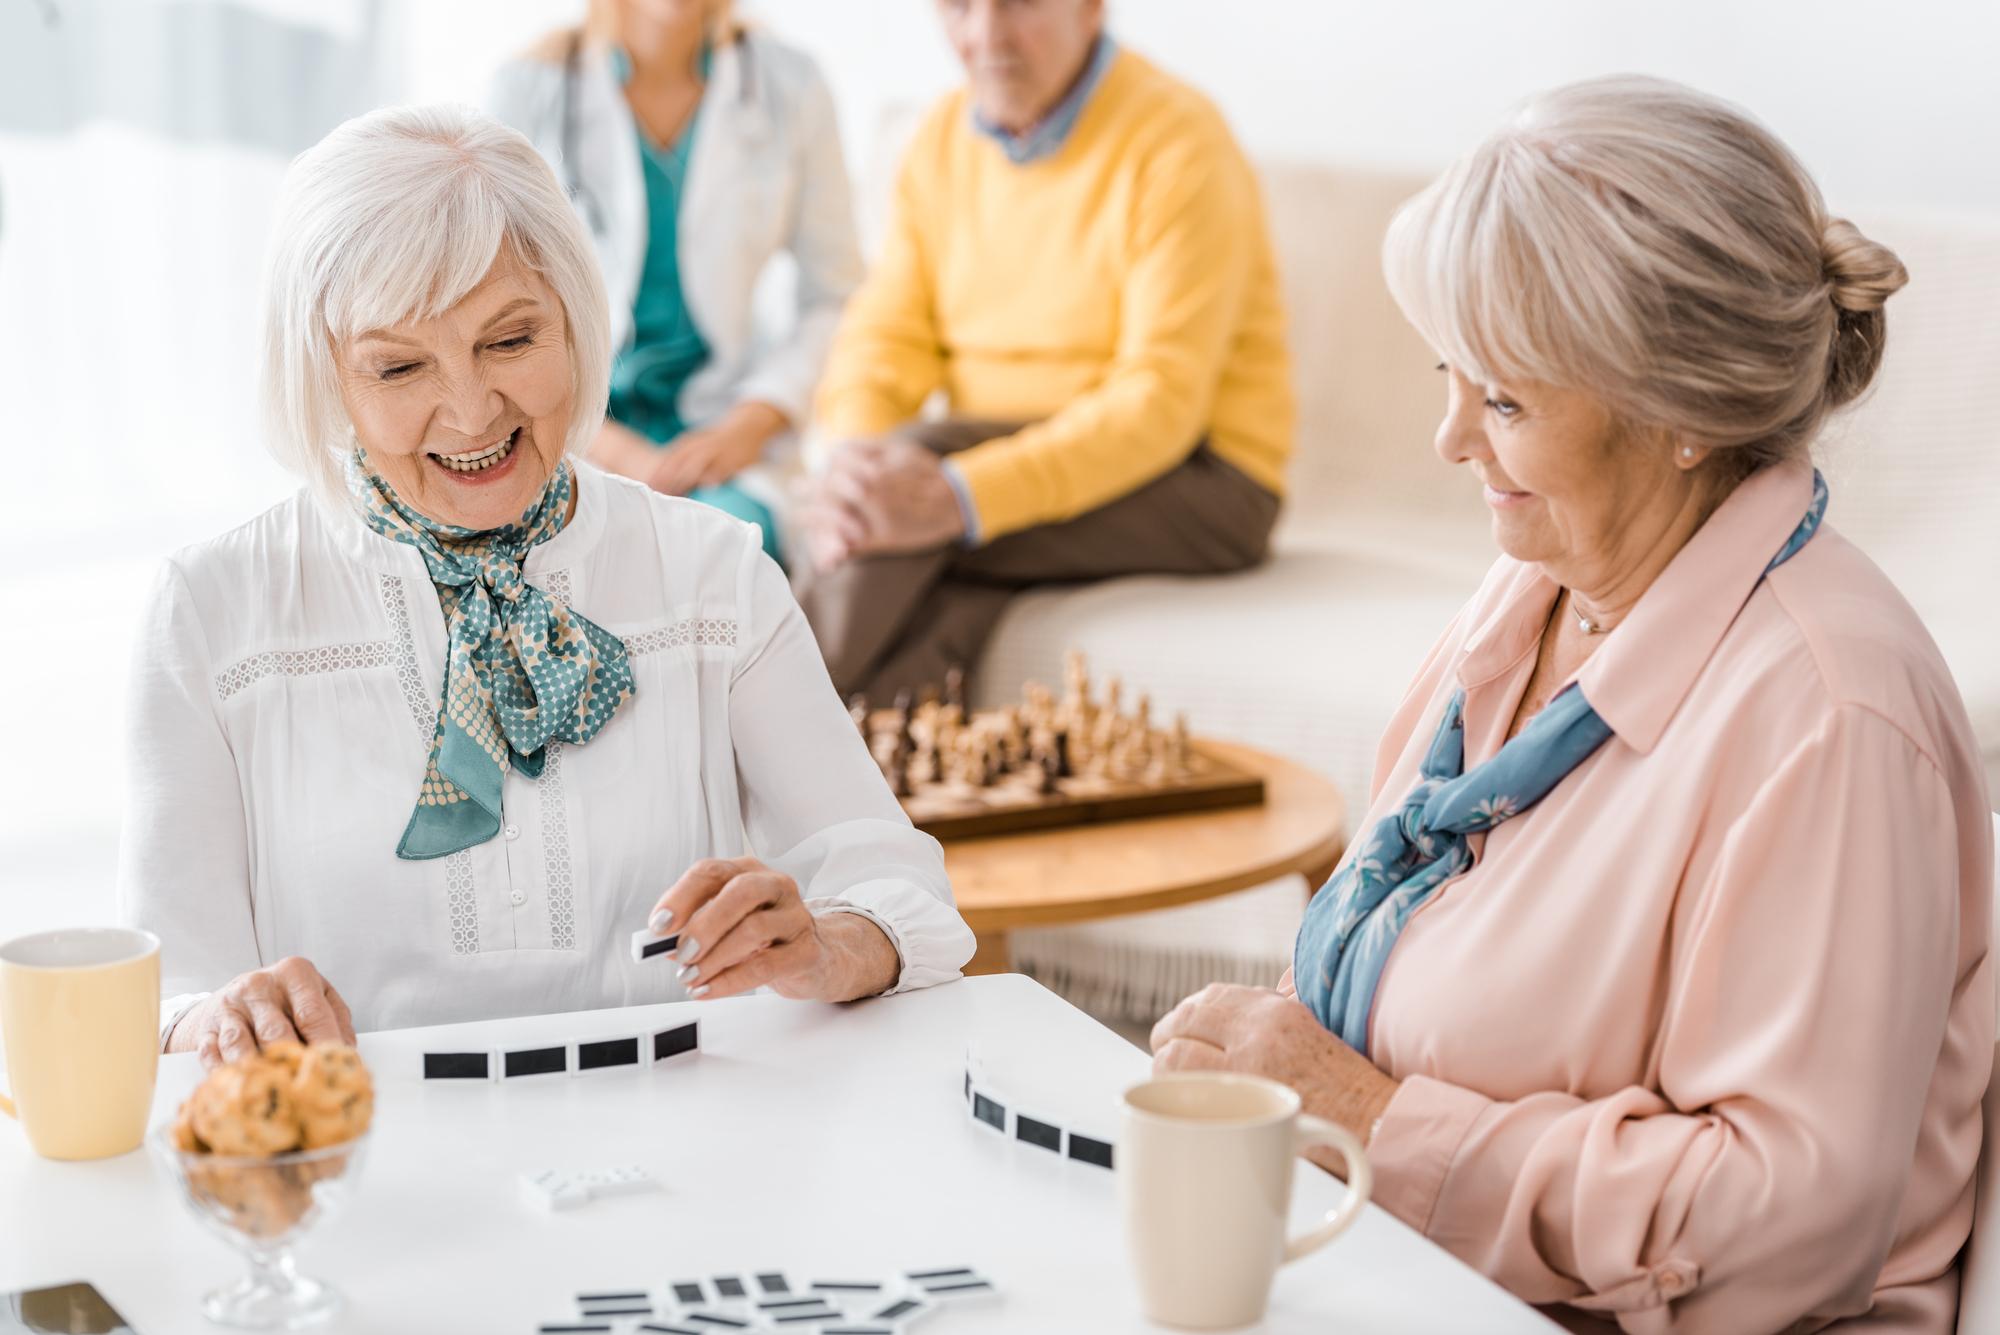 Seniors enjoying tea and dominos in a luxury senior living coommunity